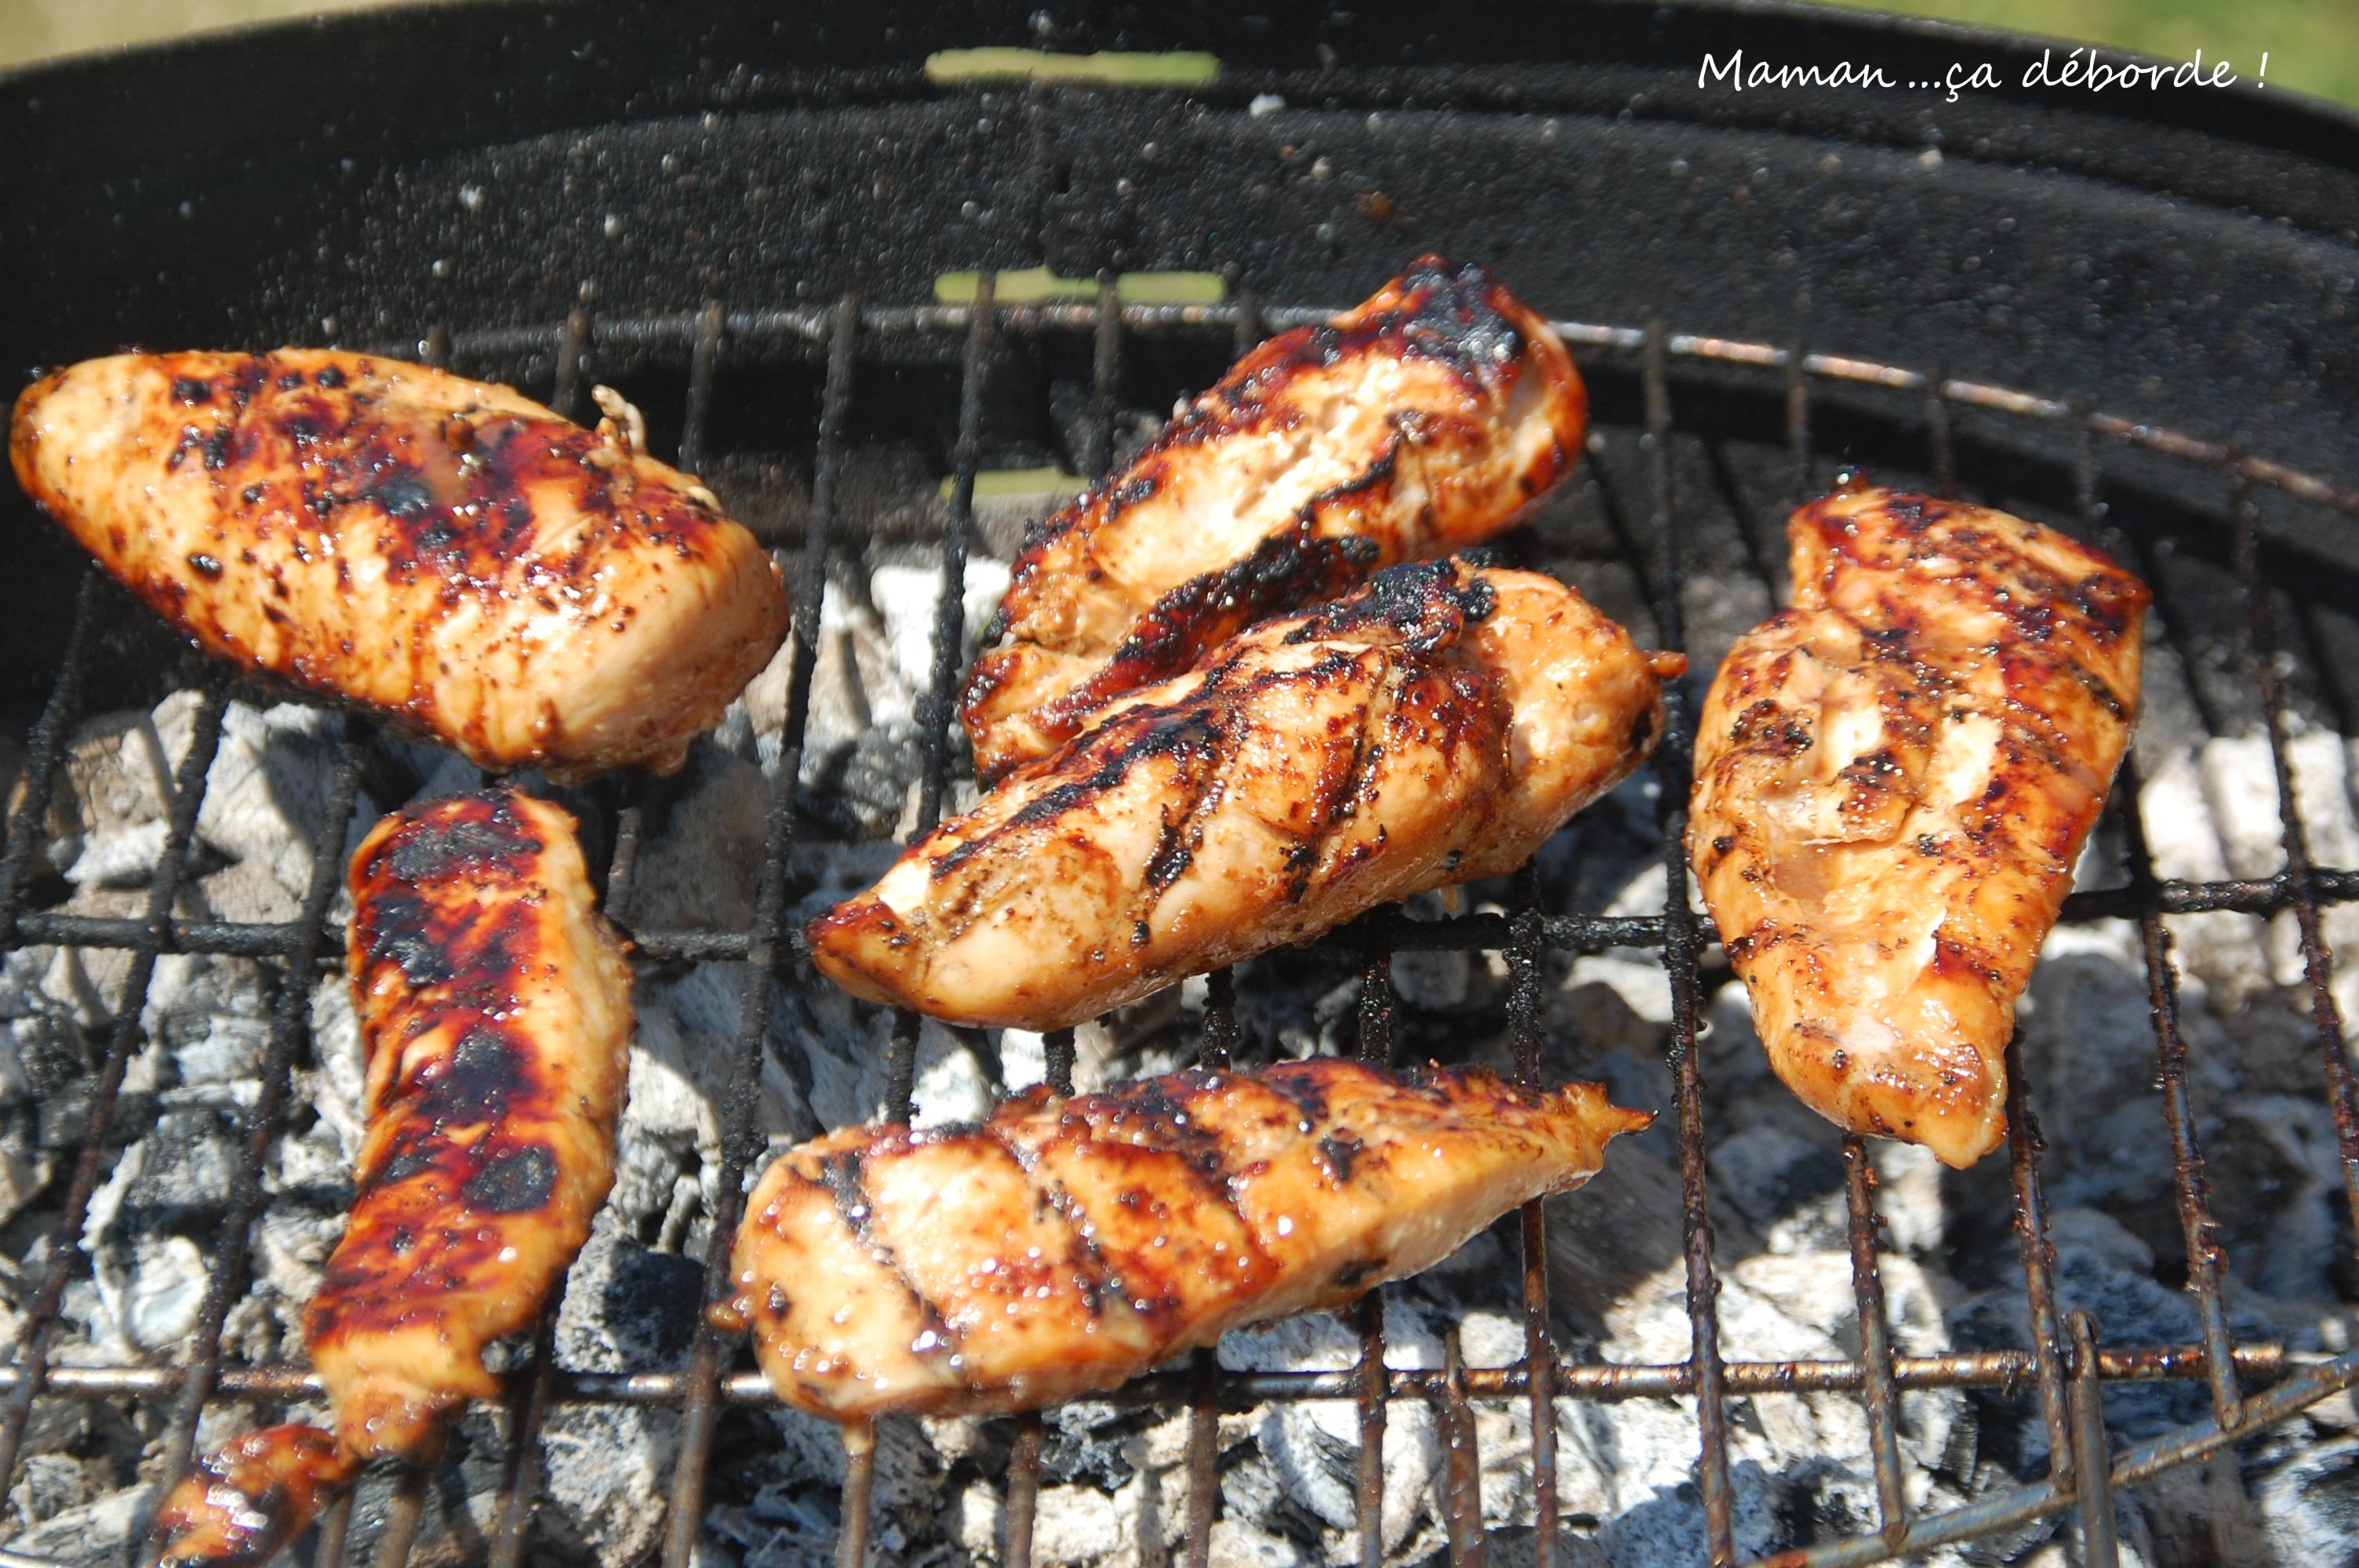 marinade pour poulet au barbecue maman a d borde. Black Bedroom Furniture Sets. Home Design Ideas